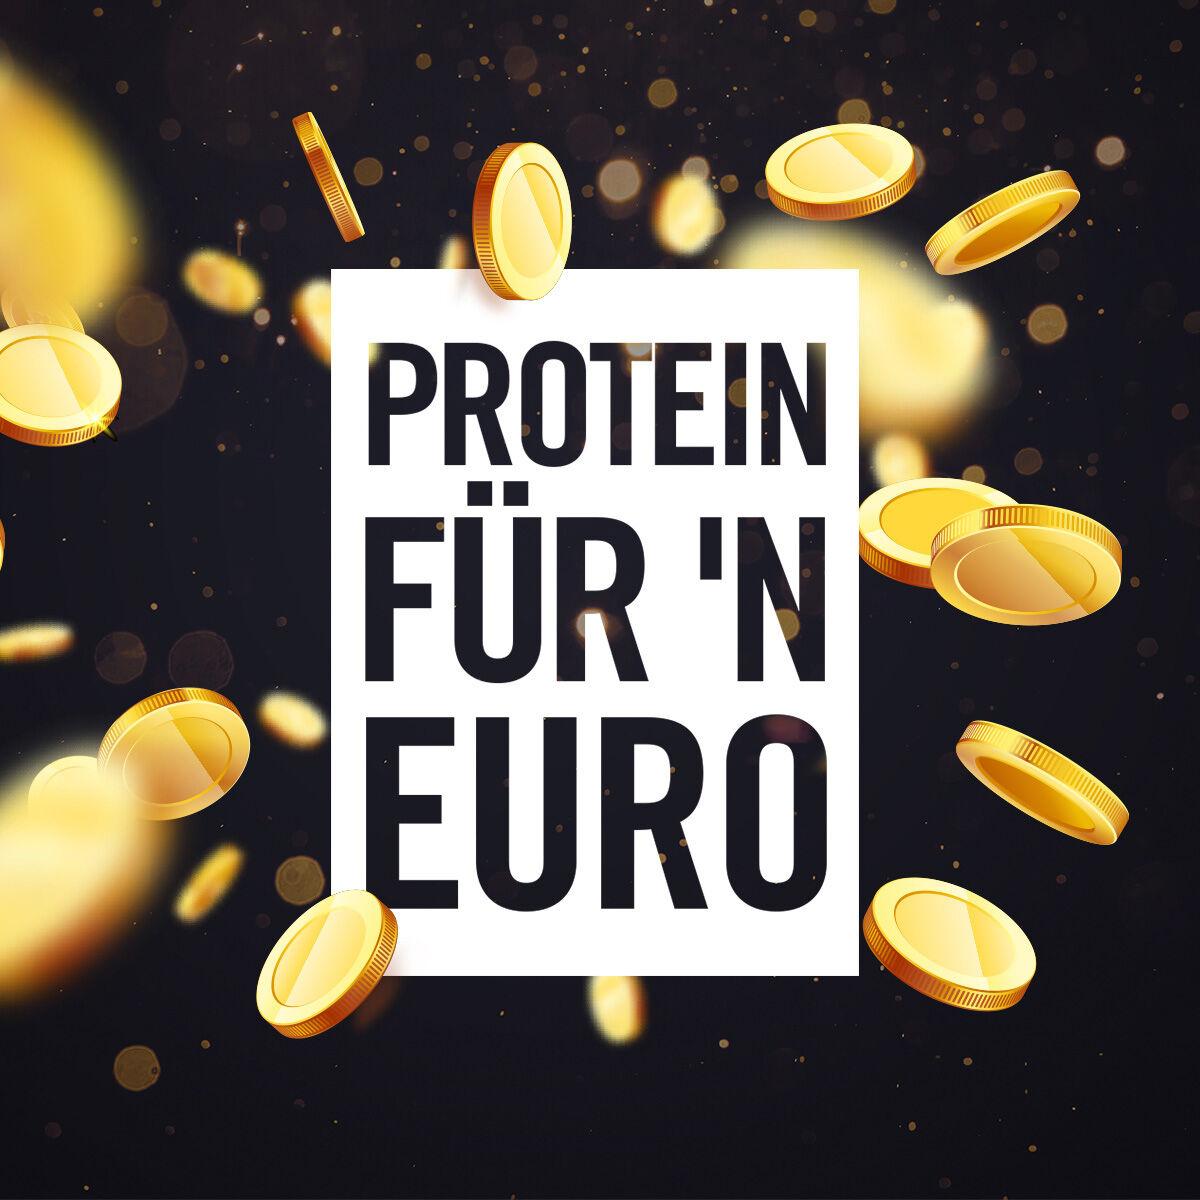 1€ Protein